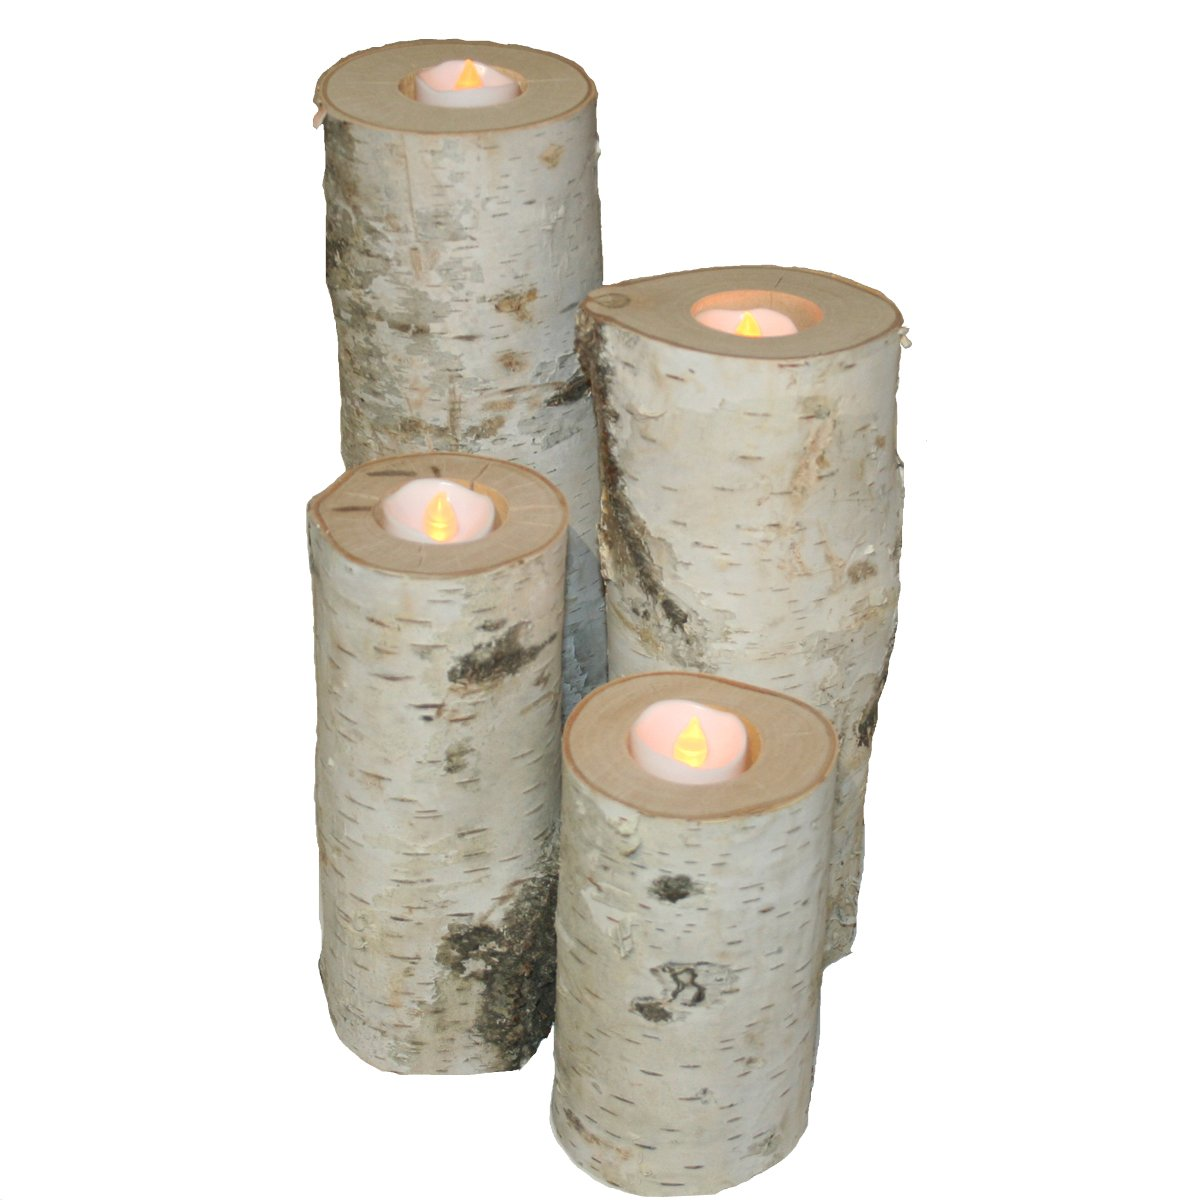 Wilson Enterprises Birch Candle Holders - Set of 4